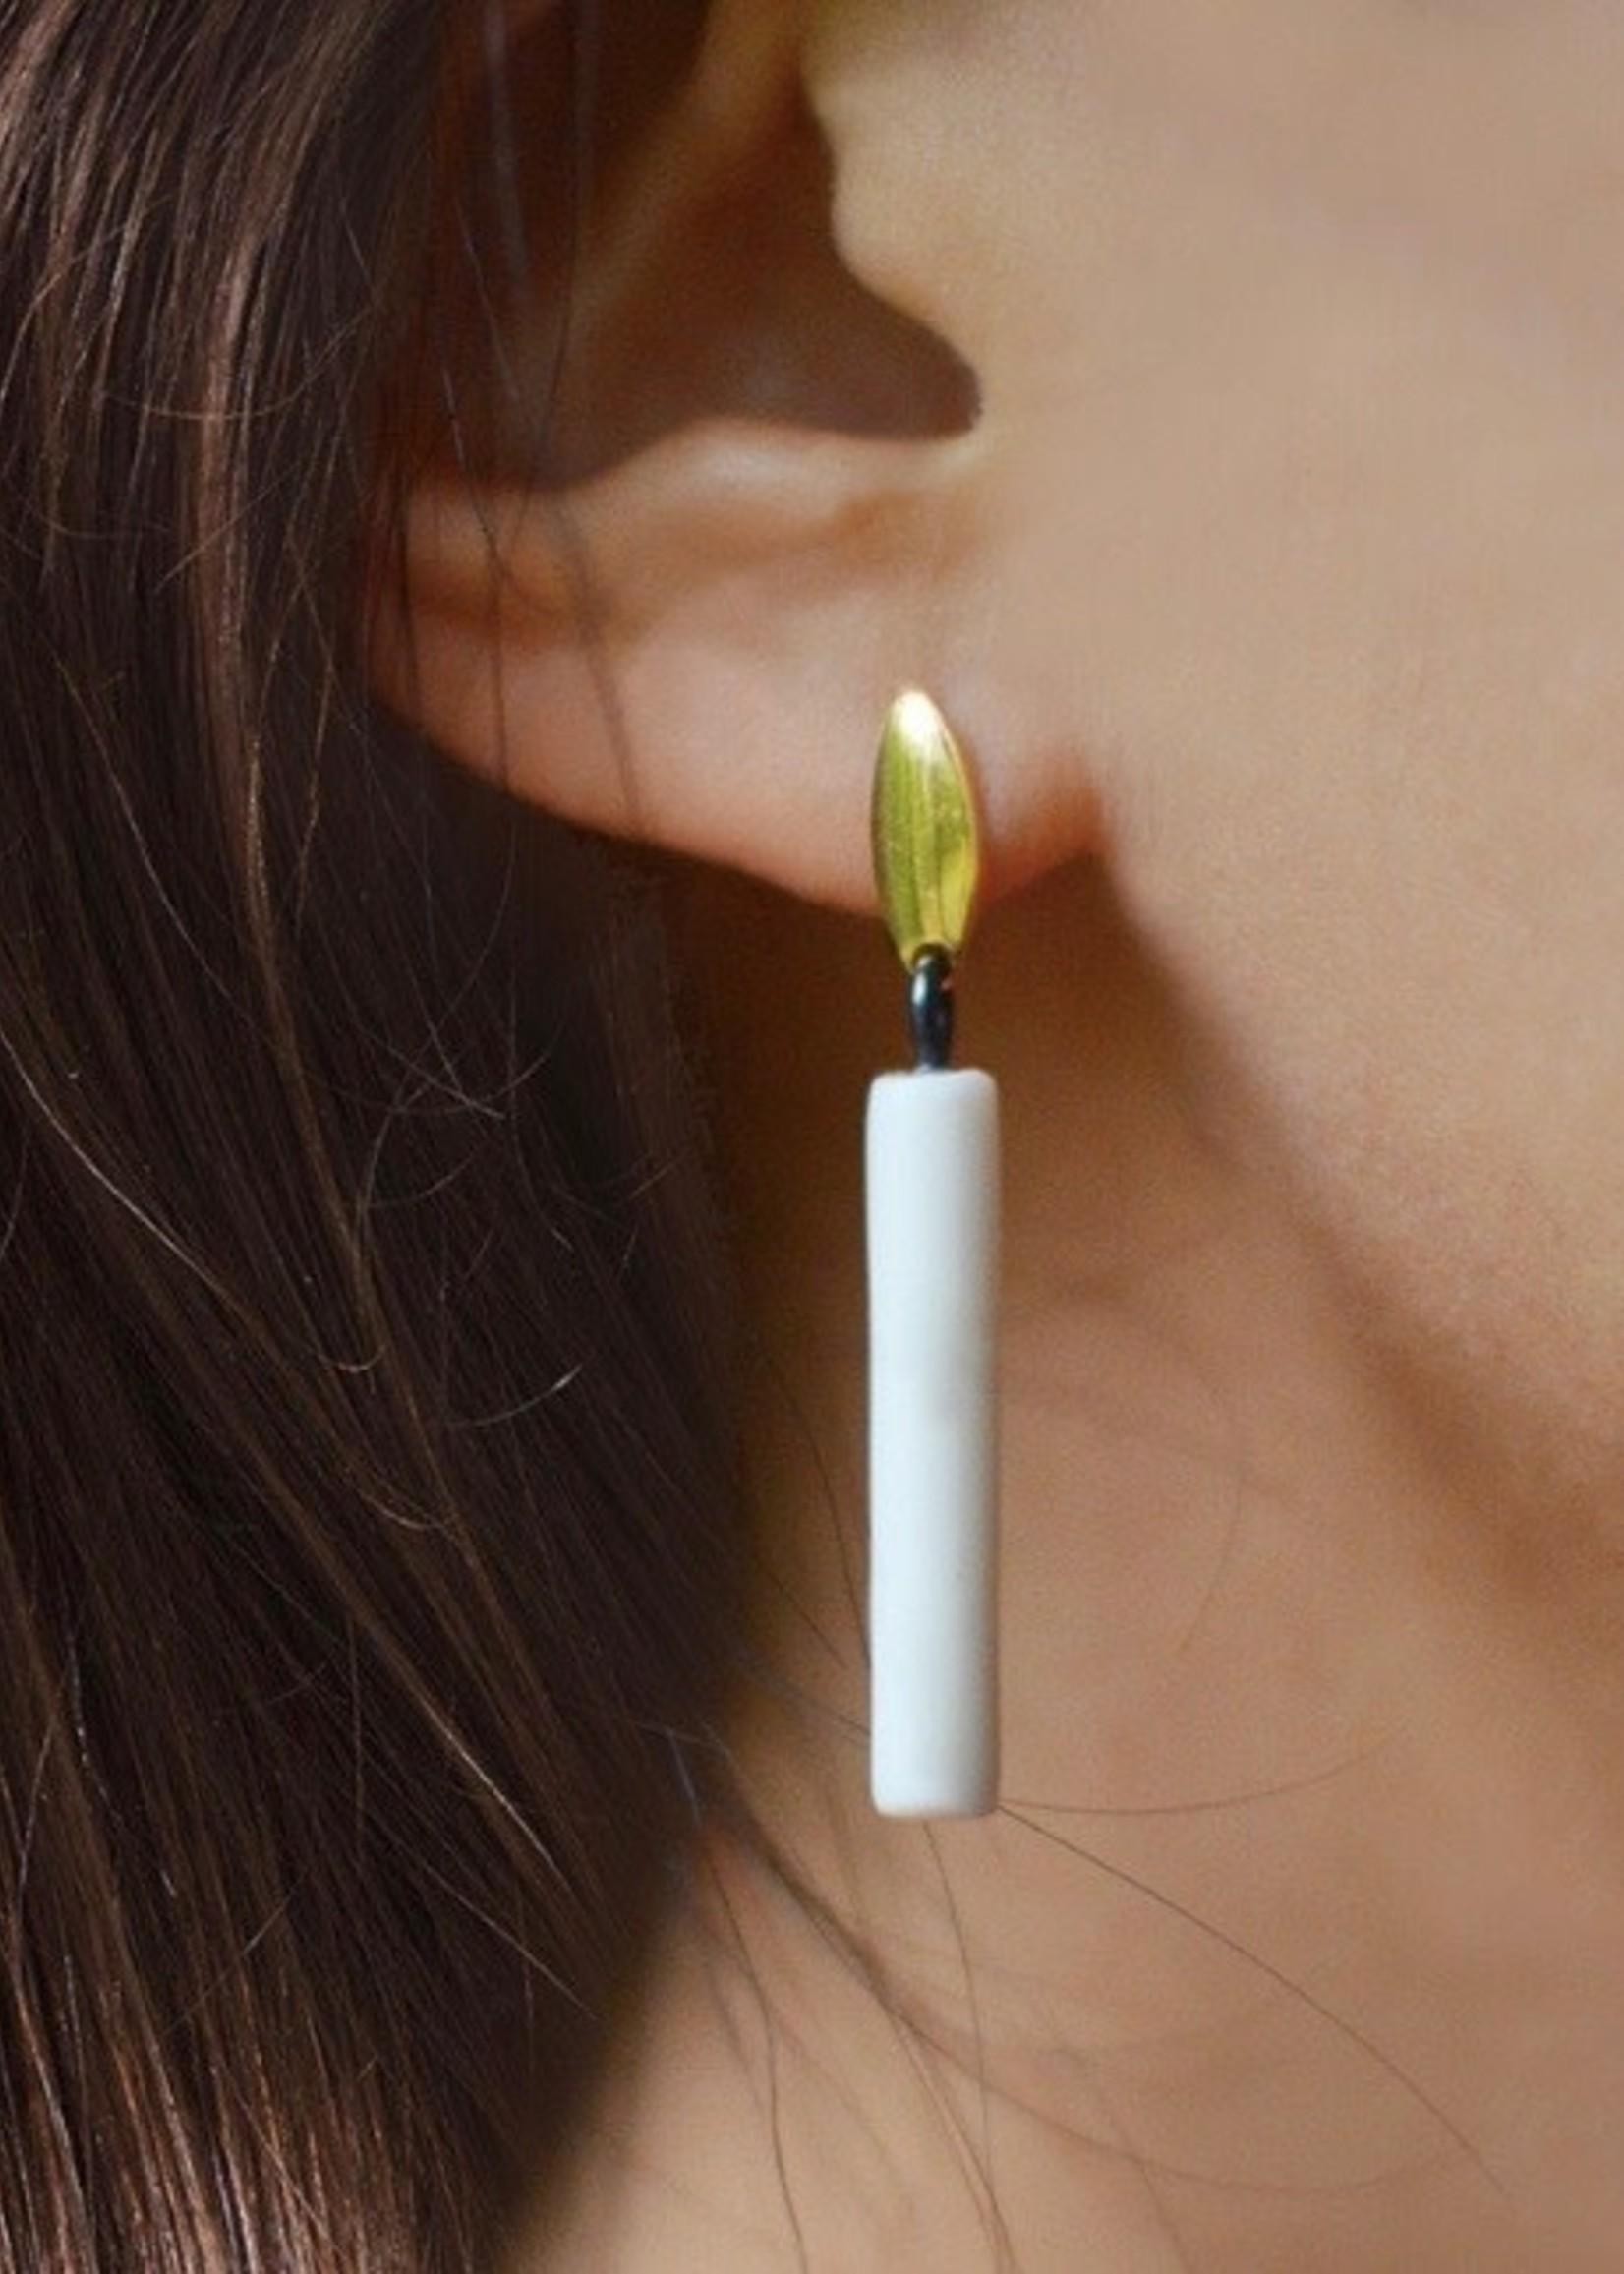 Monochromatiques Candles Earrings by Monochromatiques